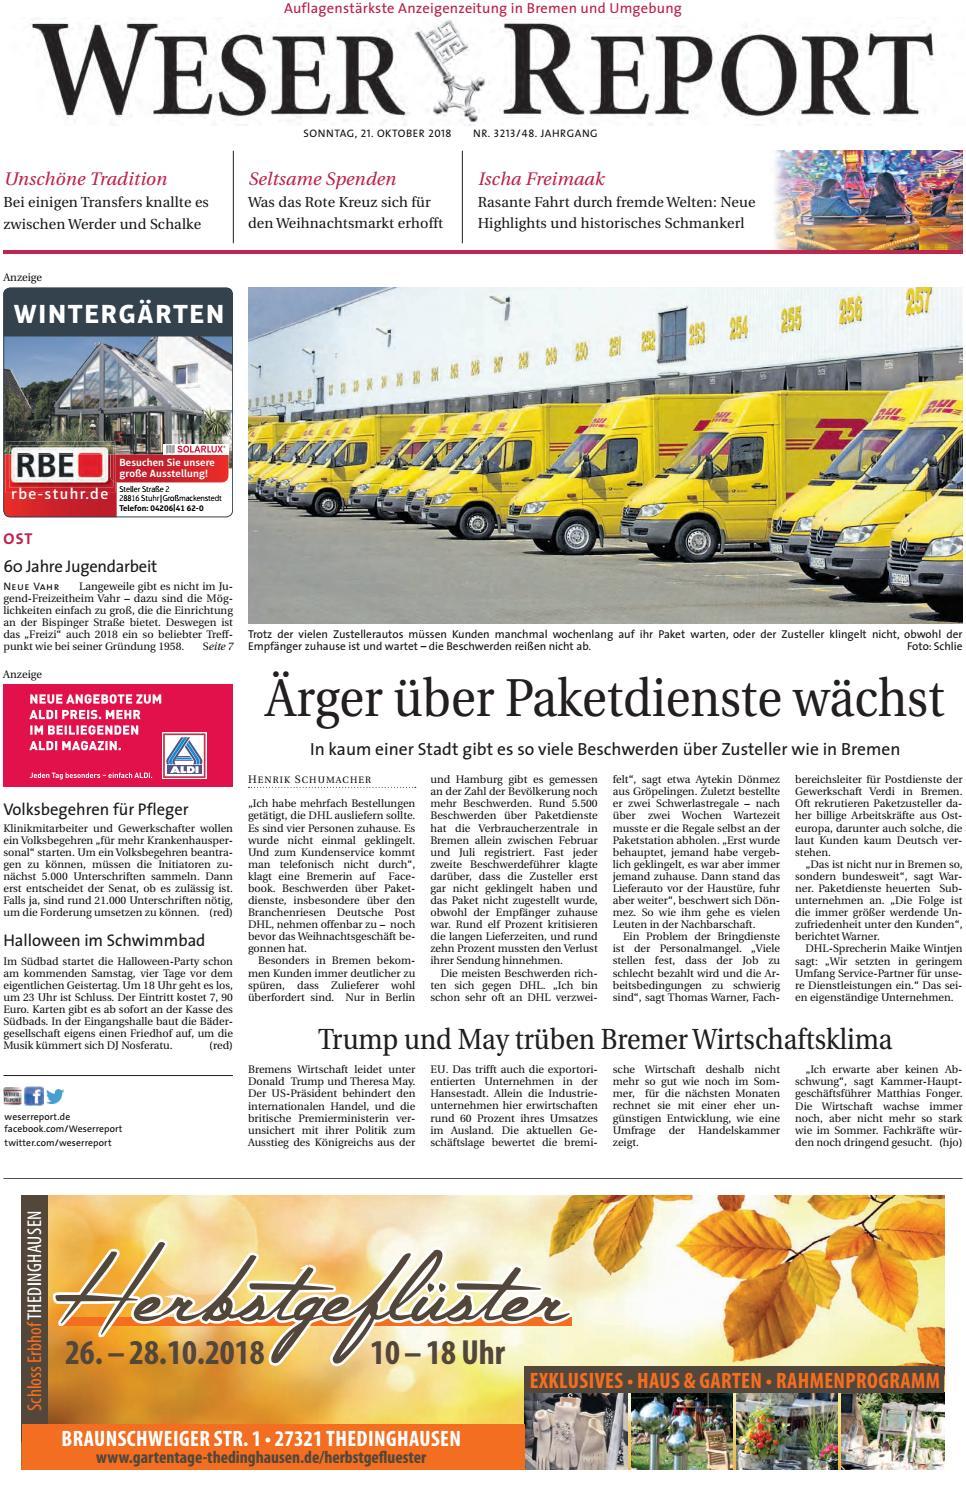 Weser Report Ost Vom 21 10 2018 By Kps Verlagsgesellschaft Mbh Issuu